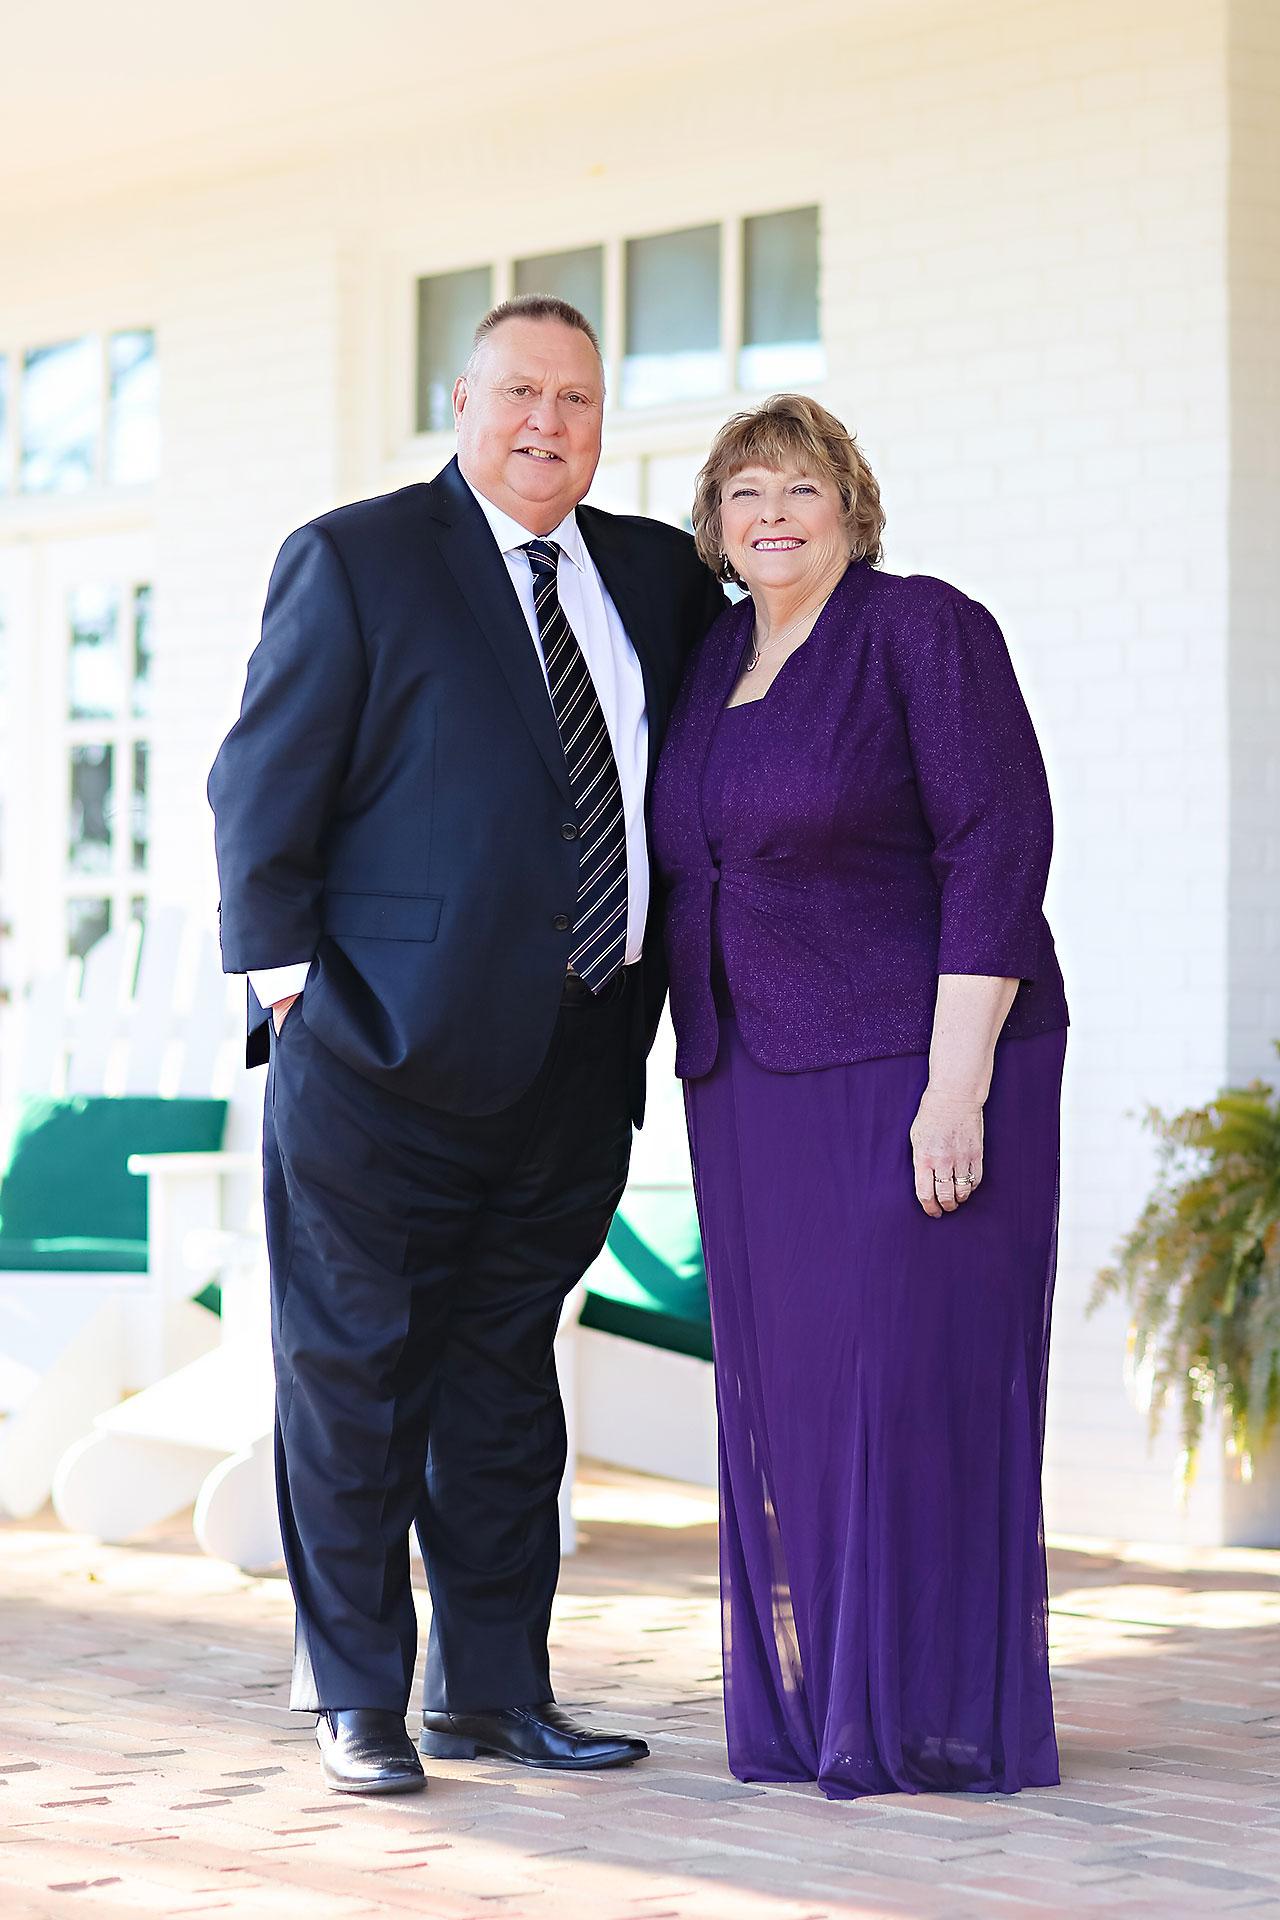 Ashley Steve Bloomington Indiana Wedding 133